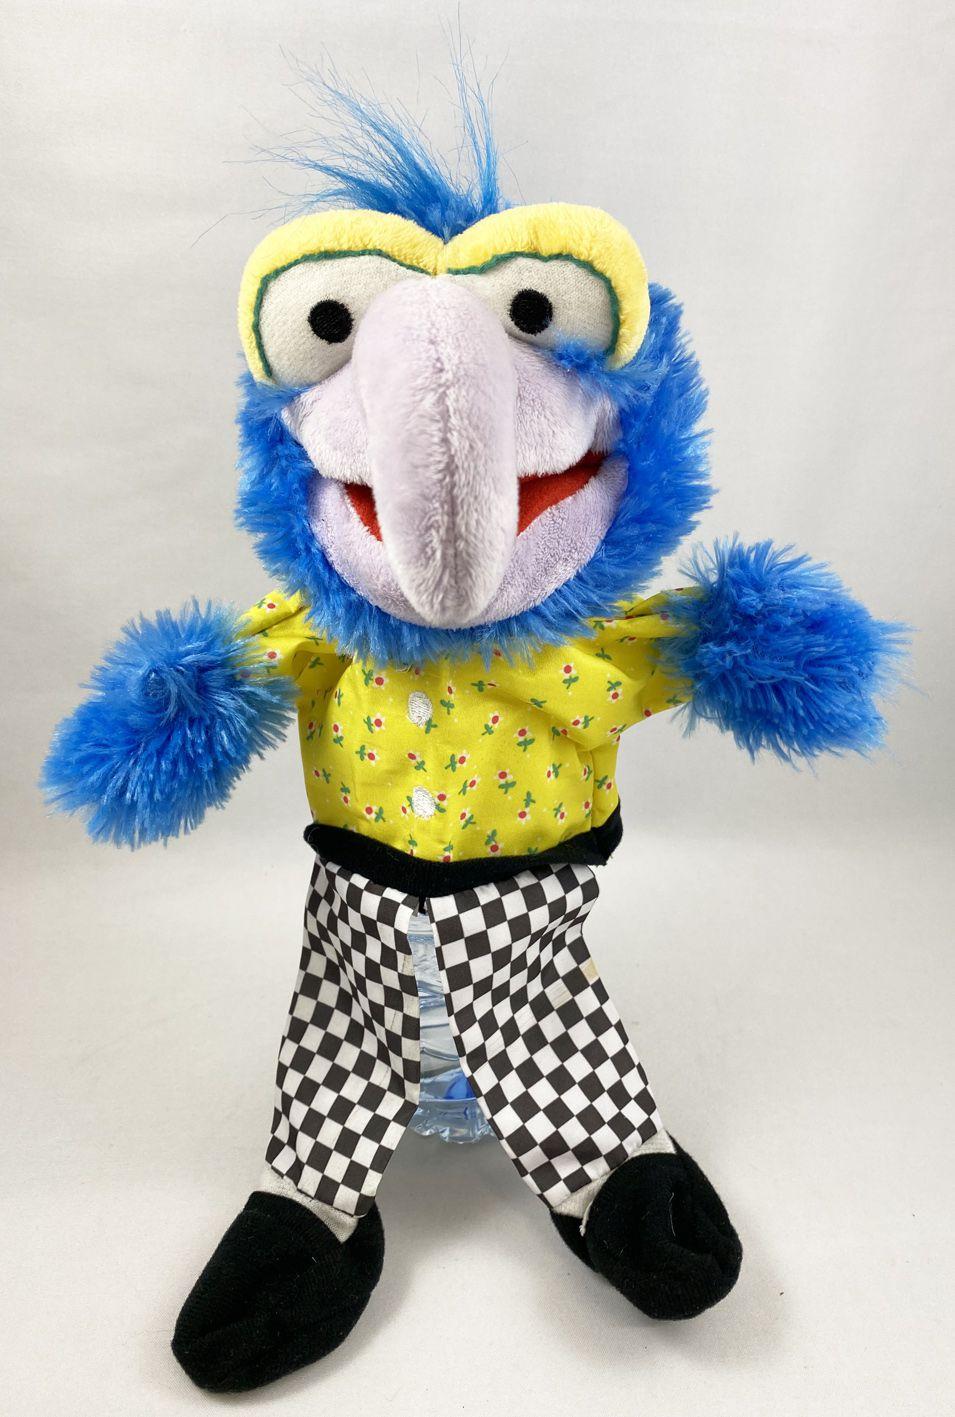 The Muppets - Marionnette à main - Gonzo - Exclusivité Albert Heijn (Hollande) 2012